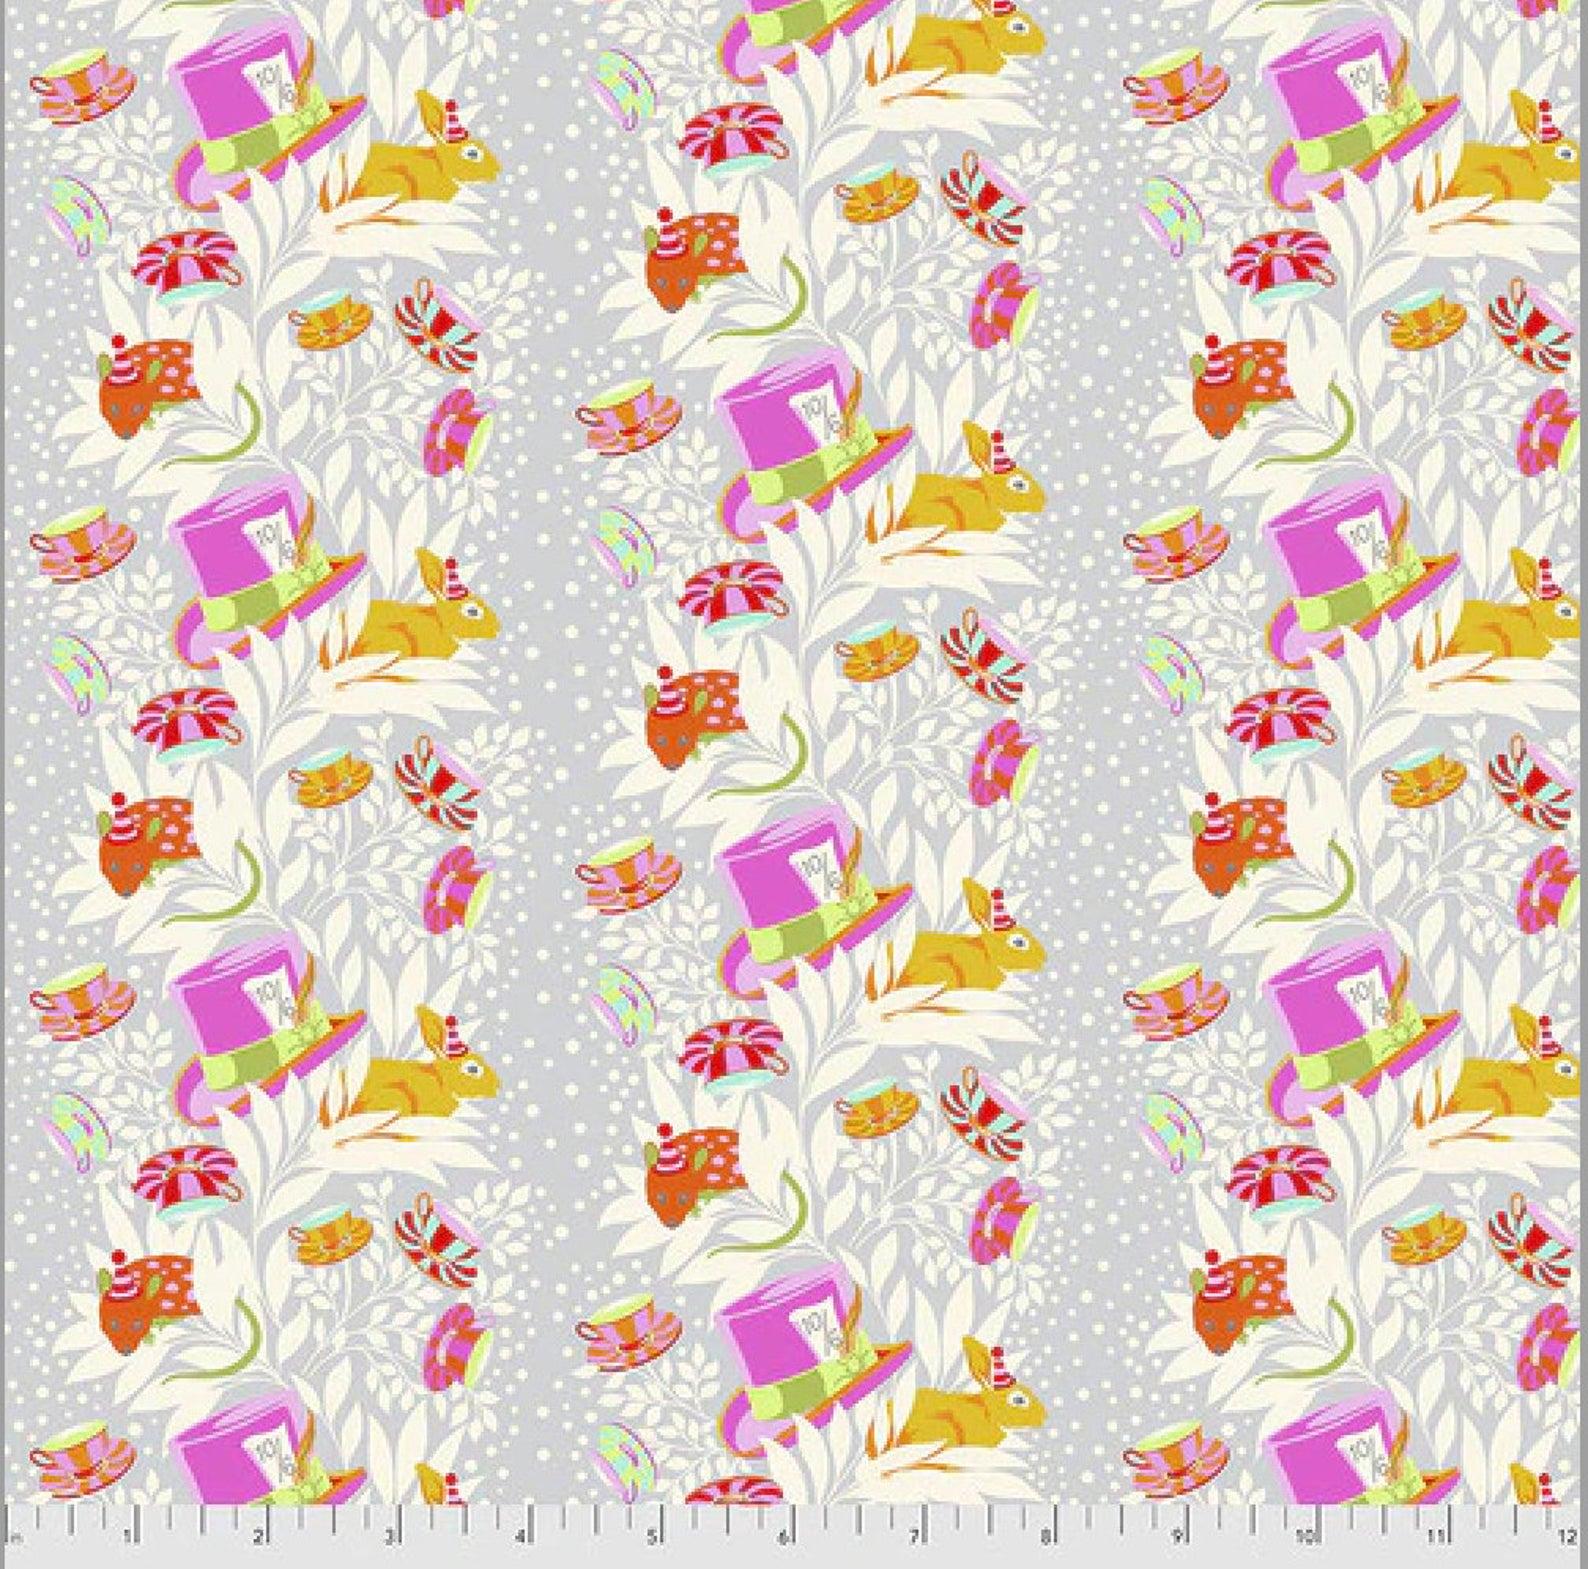 Tula Pink - Curiouser & Curiouser - 6pm Somewhere (Wonder)